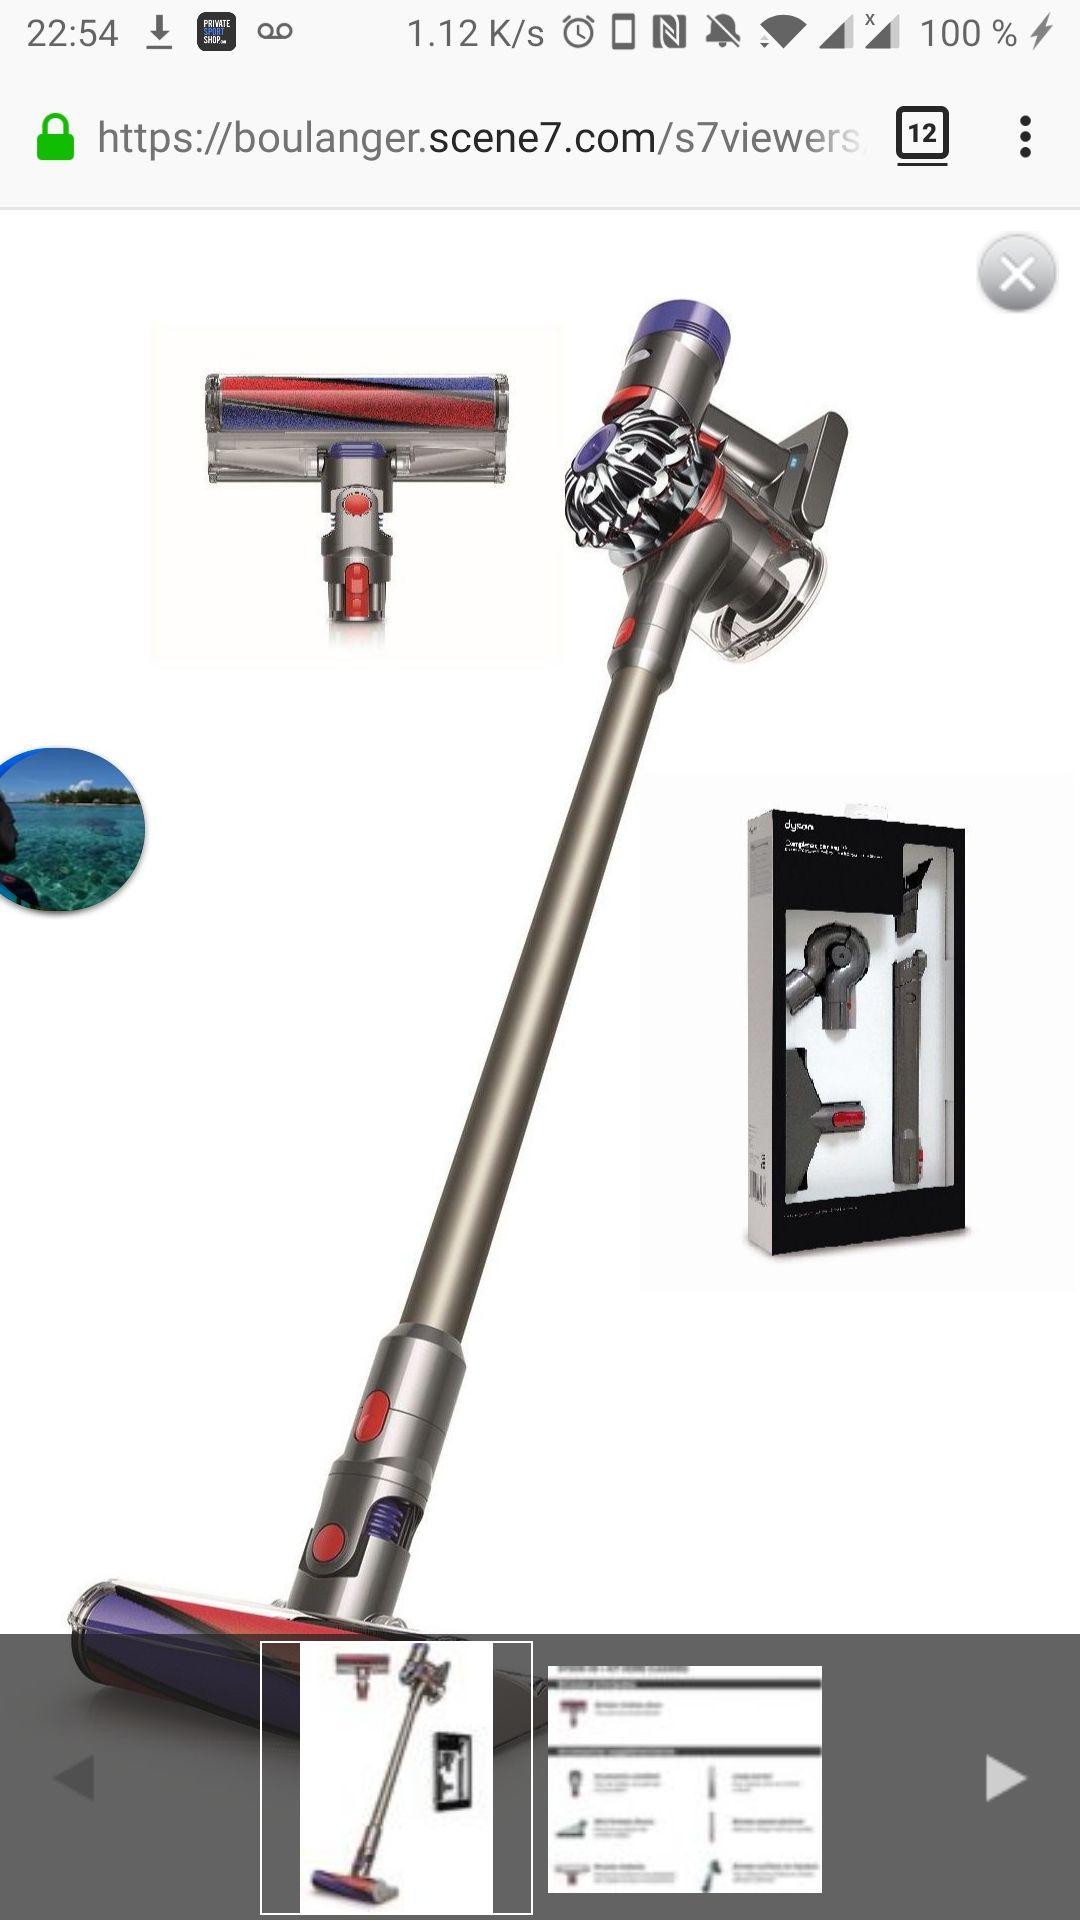 Aspirateur balai Dyson V8 + Kit Home cleaning (vendeur tiers)